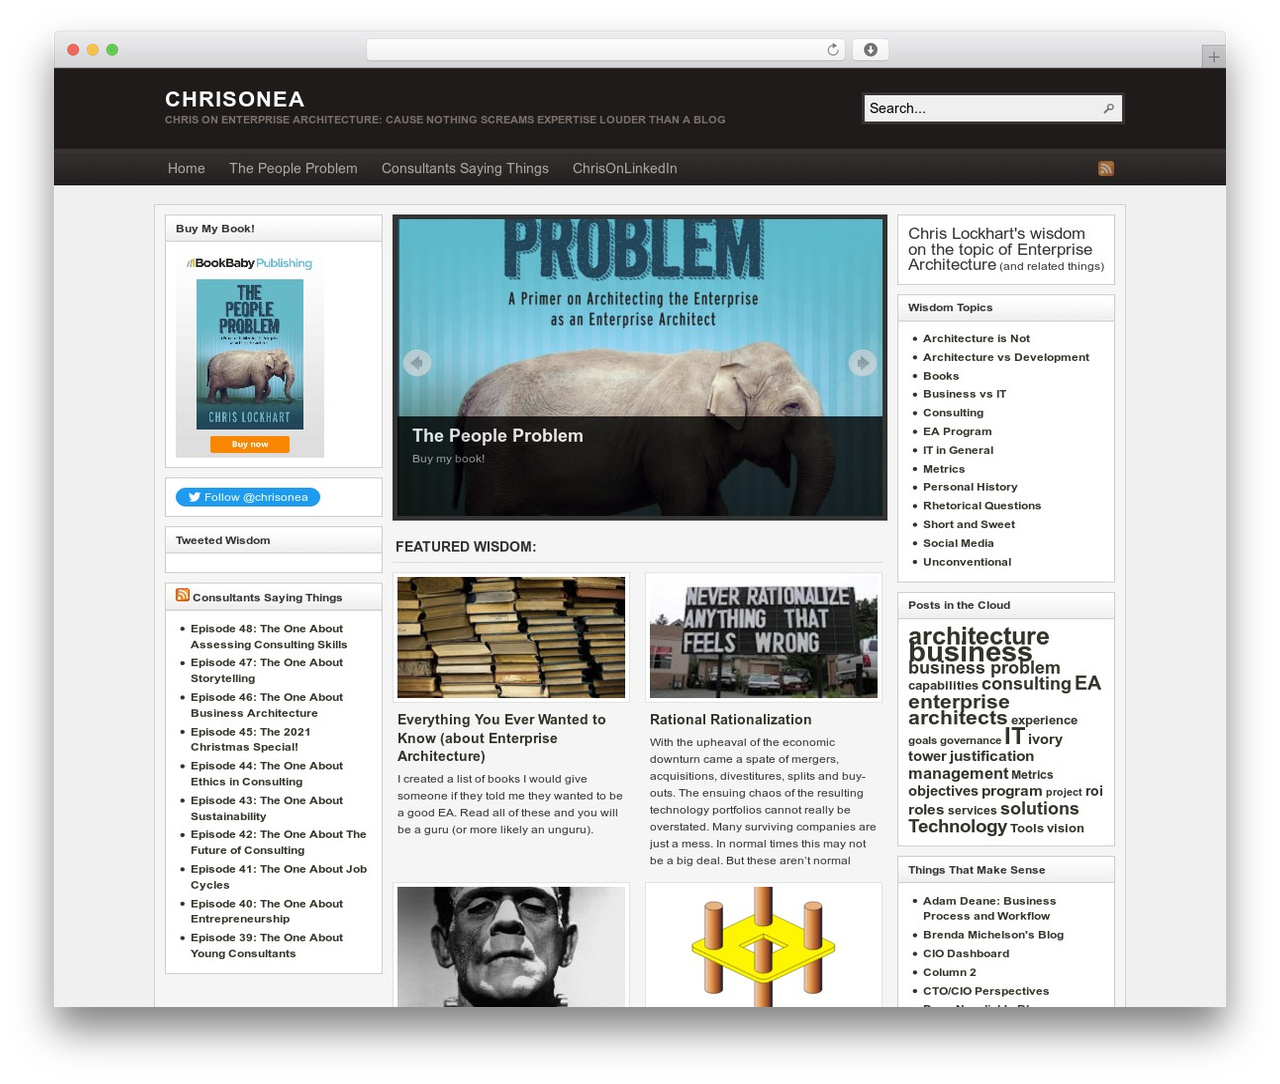 Arras best WordPress theme by Melvin Lee - chrisonea com